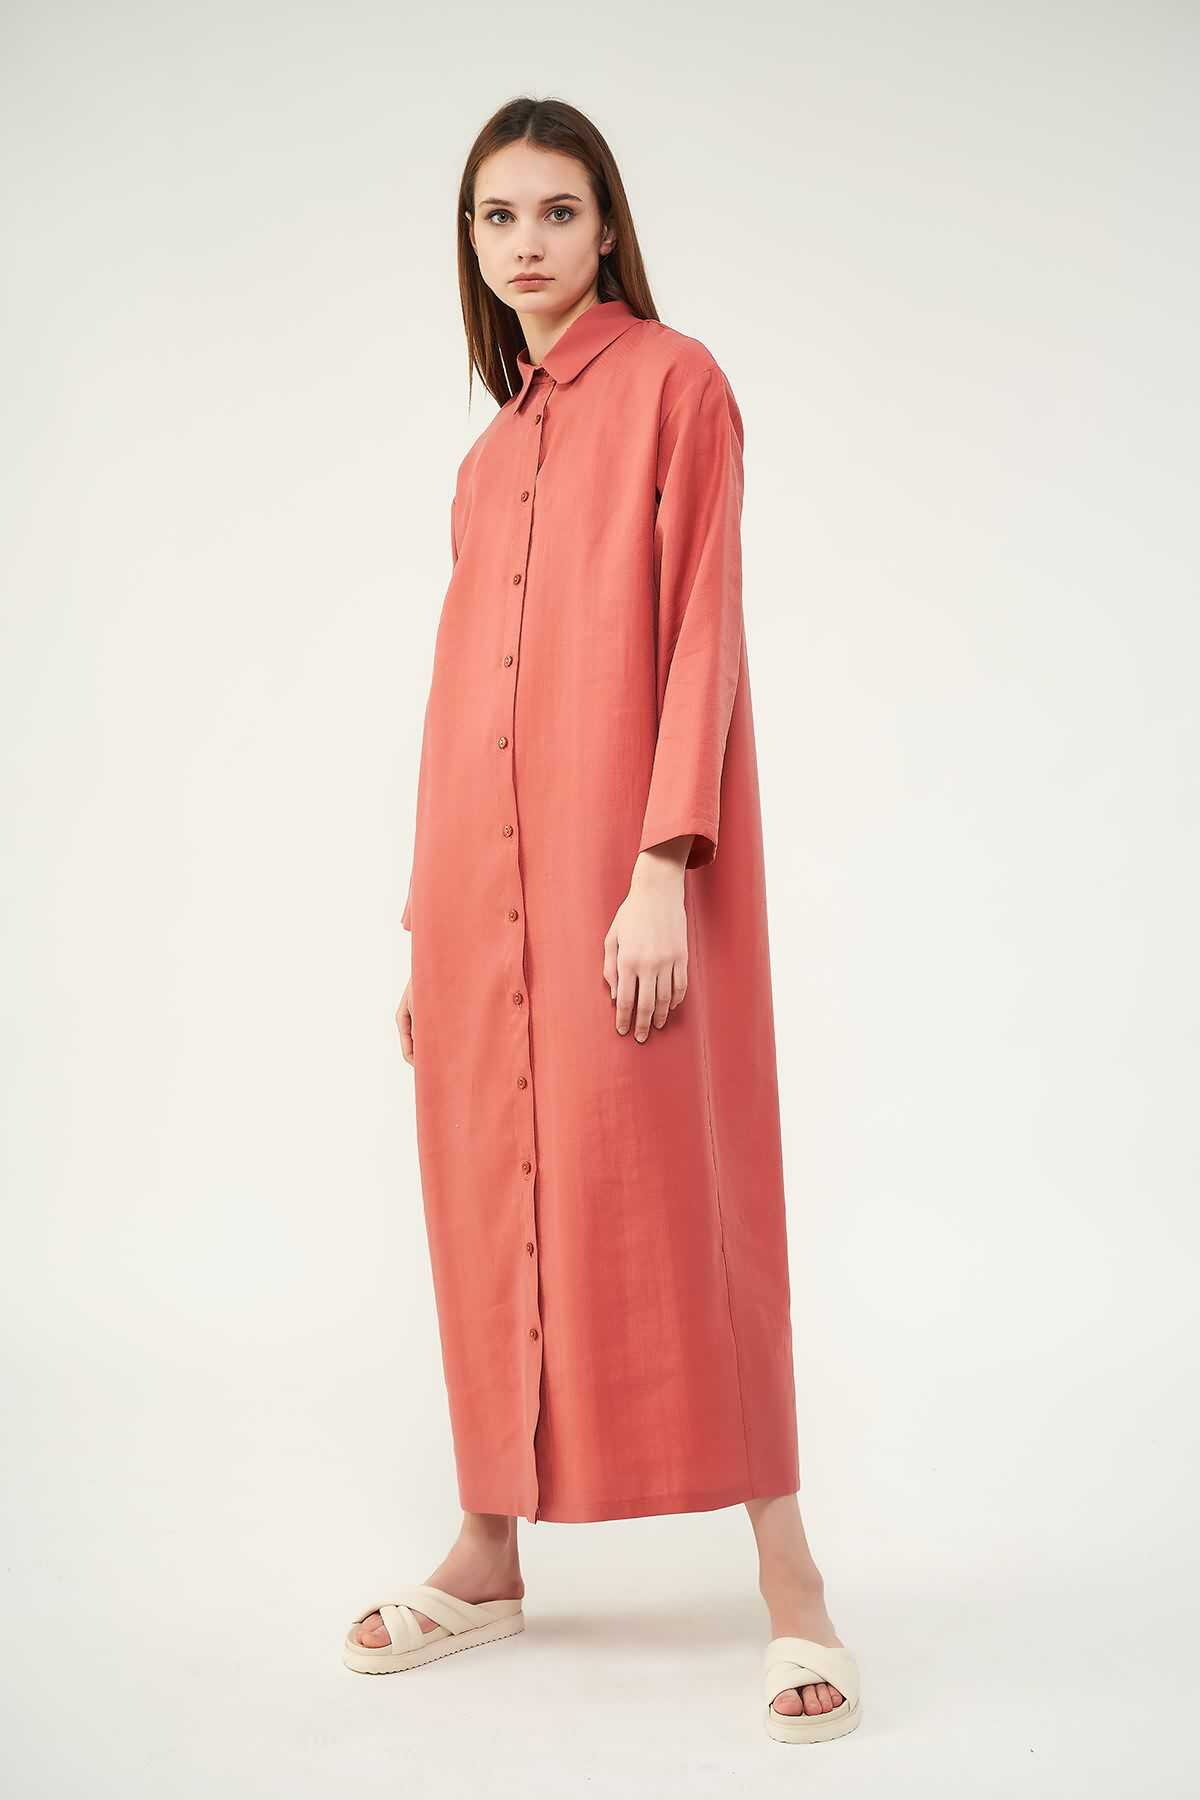 Mevra - Pileli Tunik Elbise Pudra